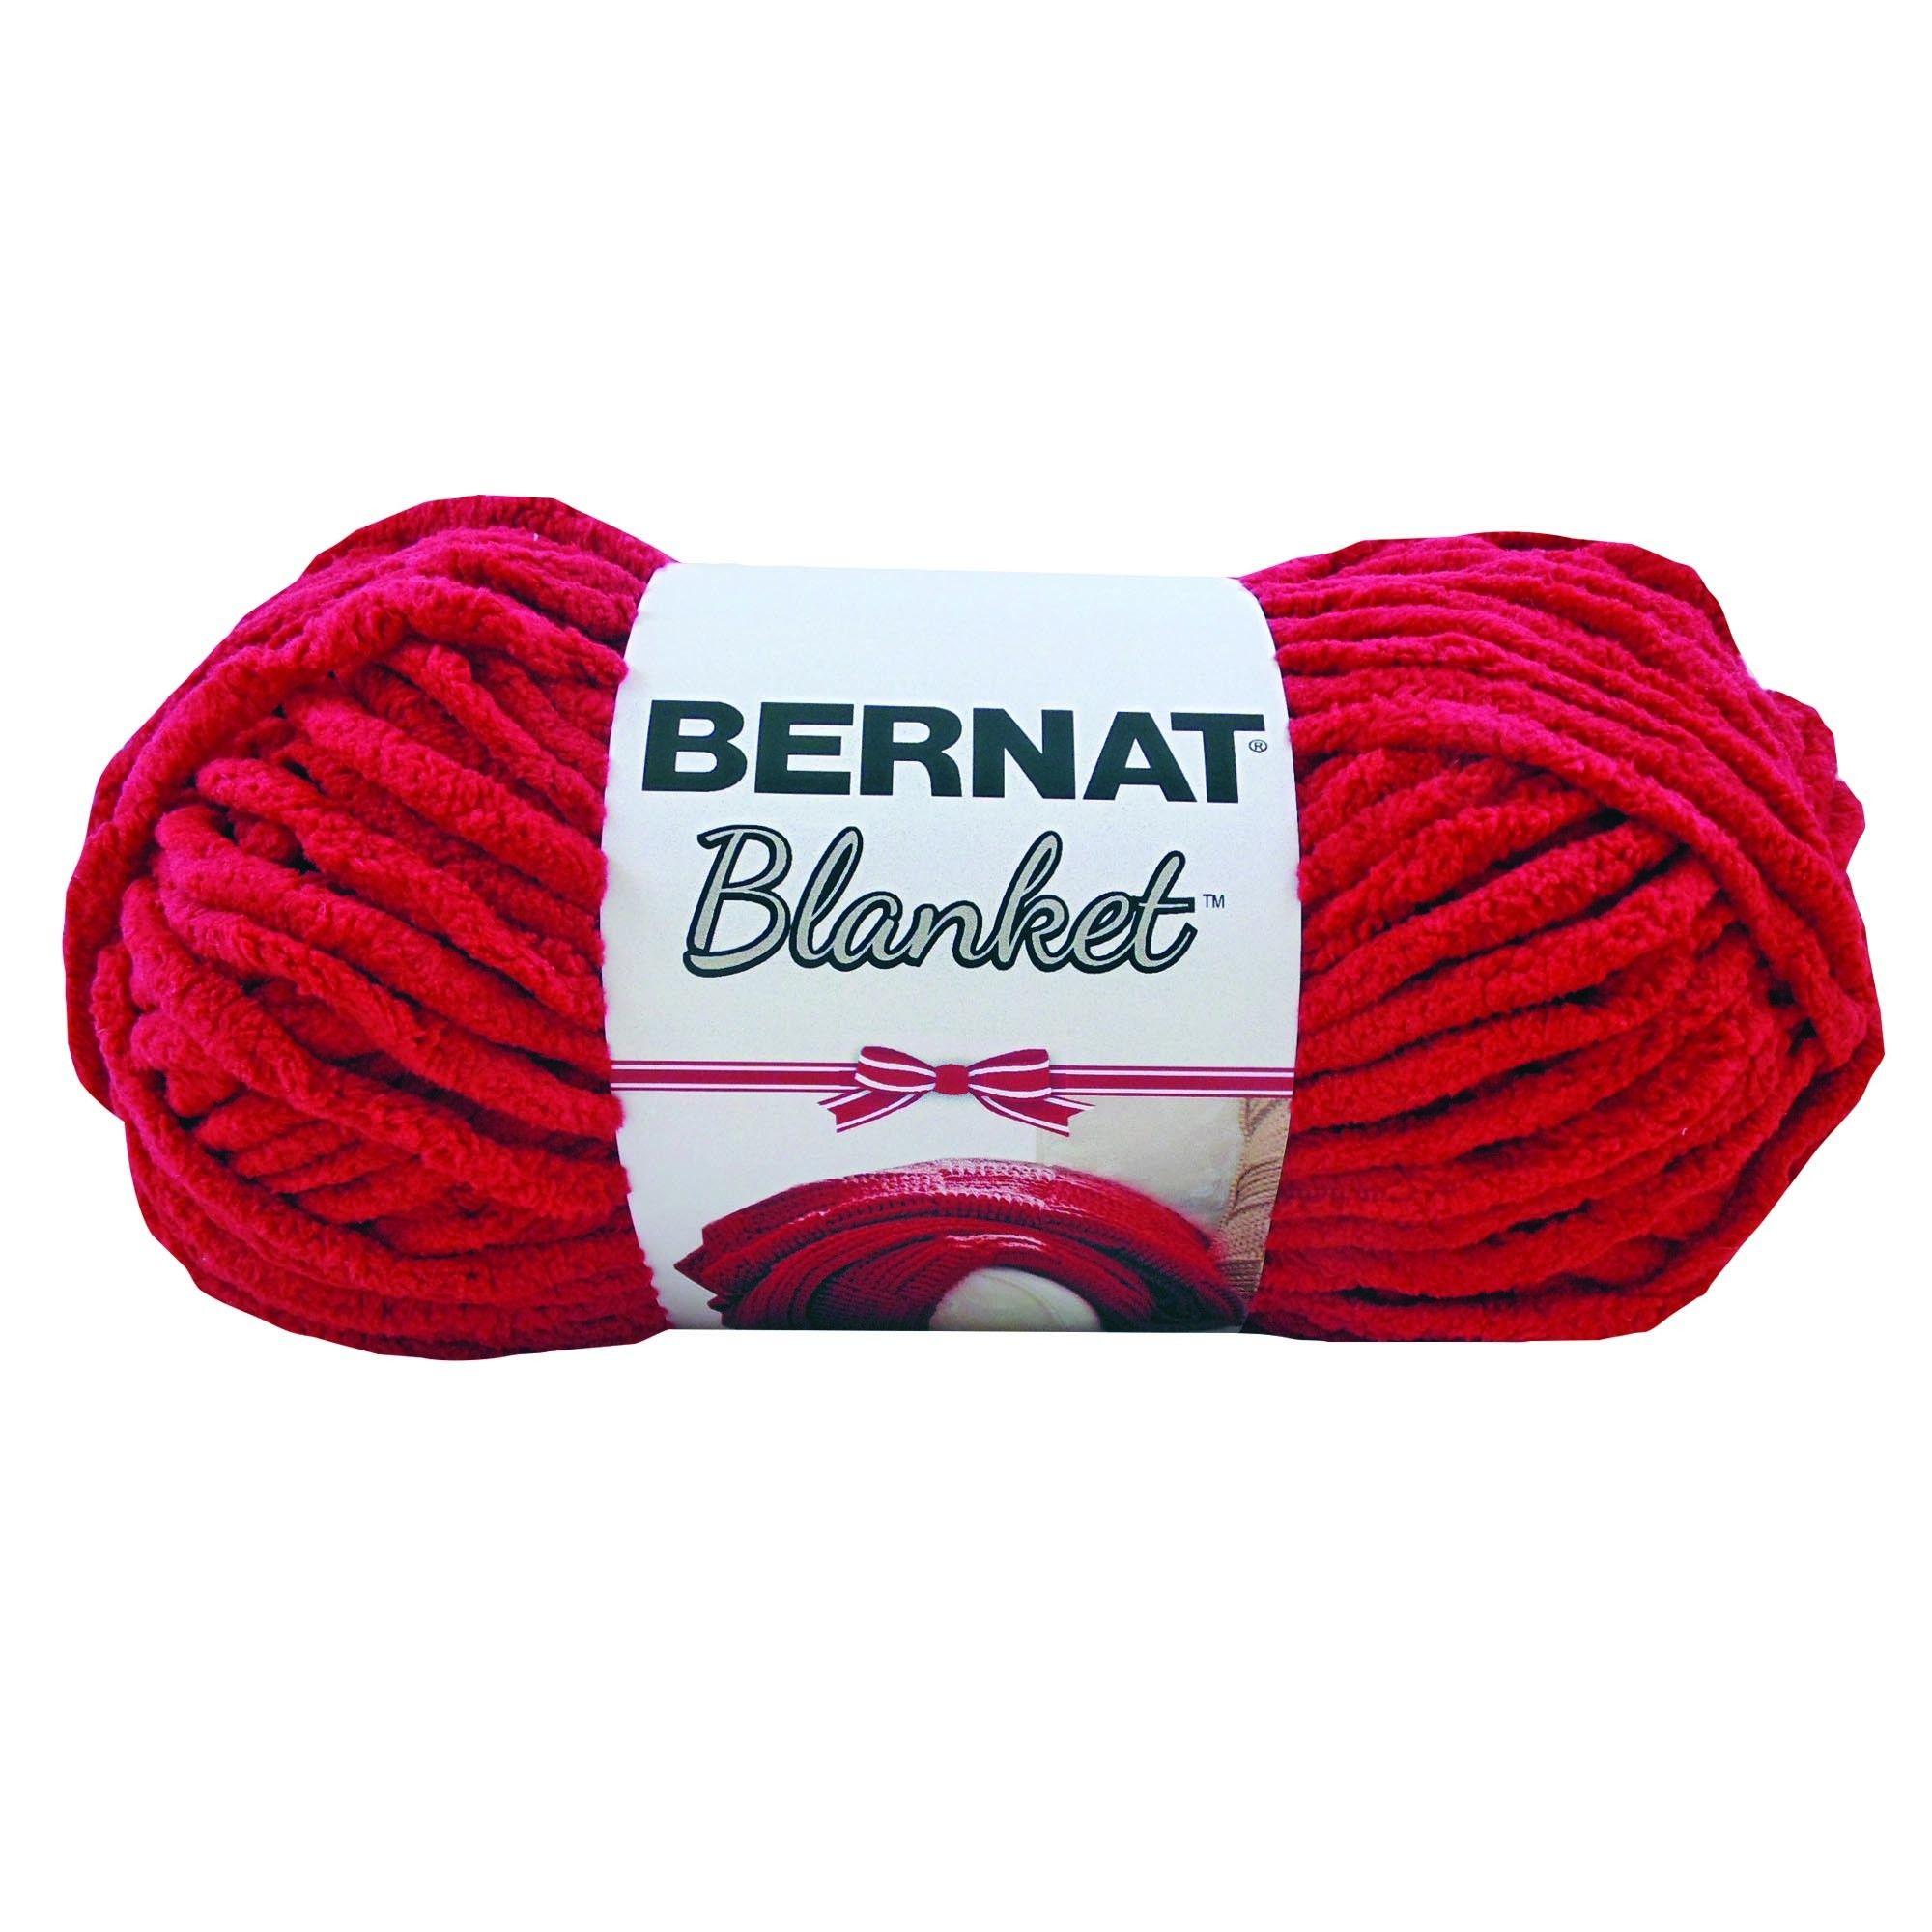 7d4df04c95 Yarnspirations.com - Bernat Blanket Holiday - Yarn